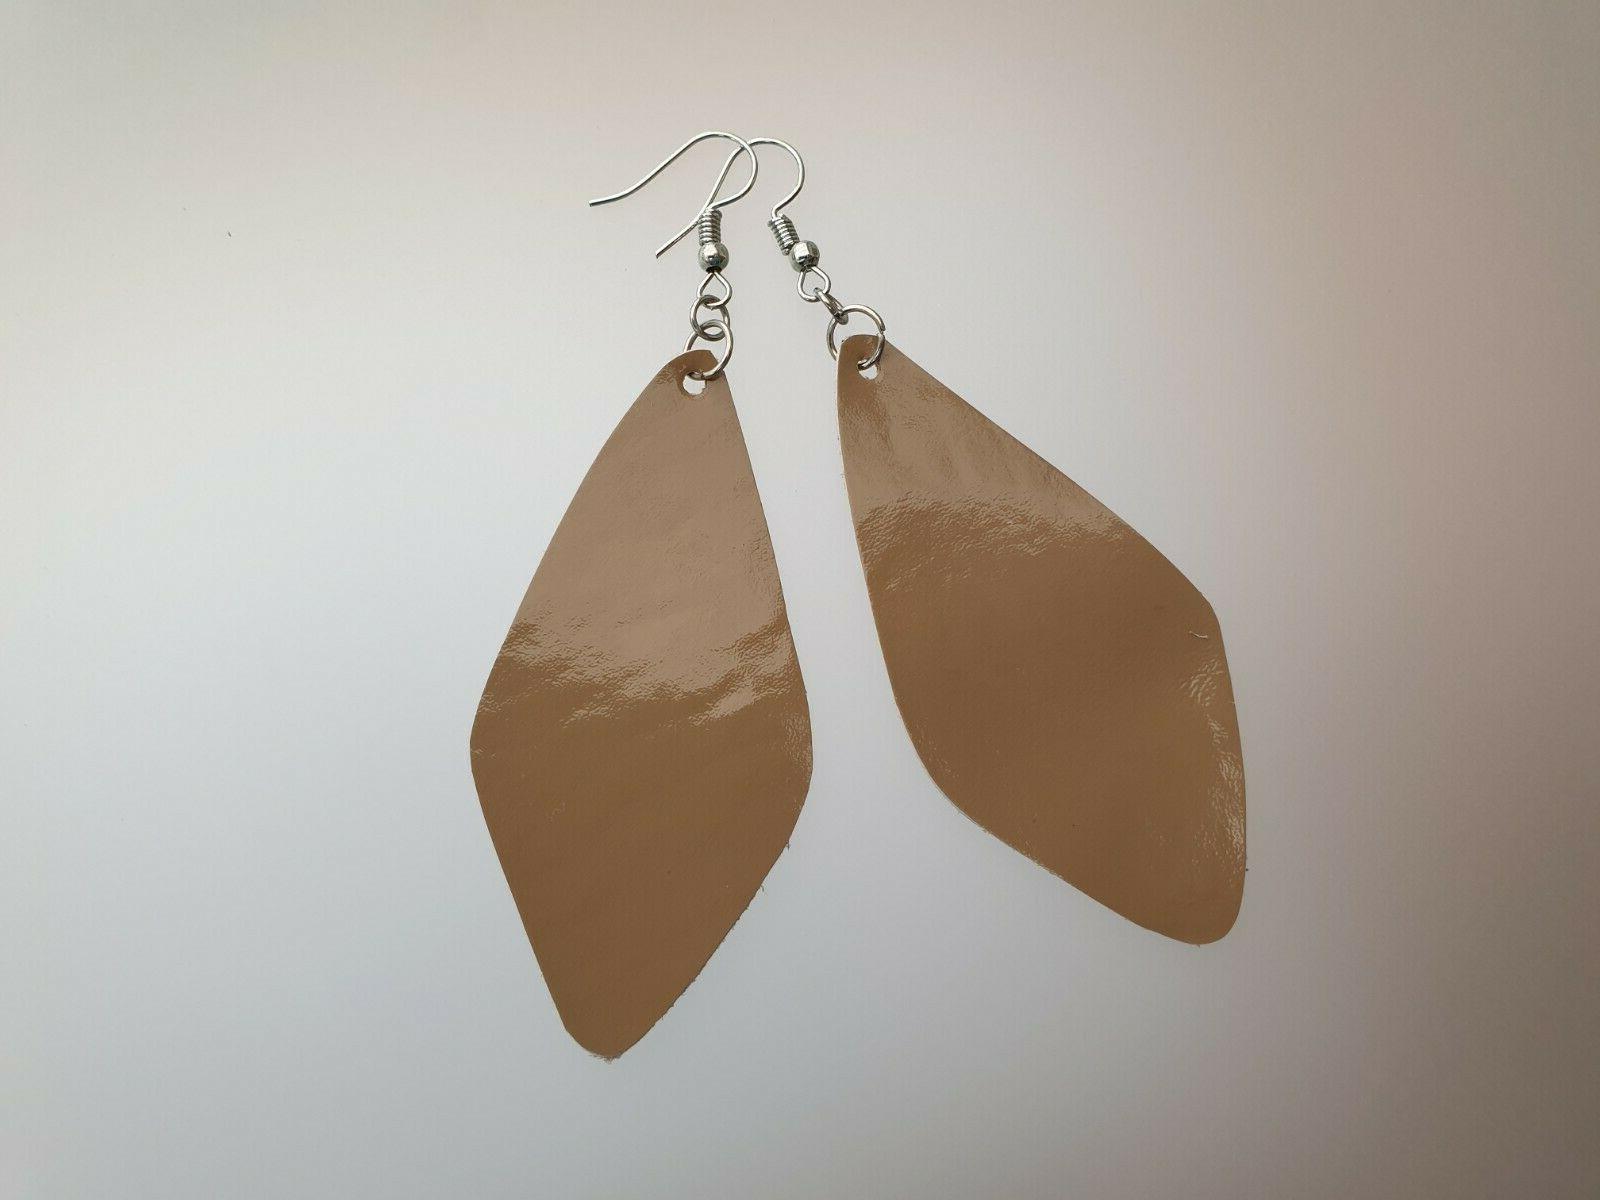 Handmade Dangle Earrings Fashion Jewelry Gift for Her